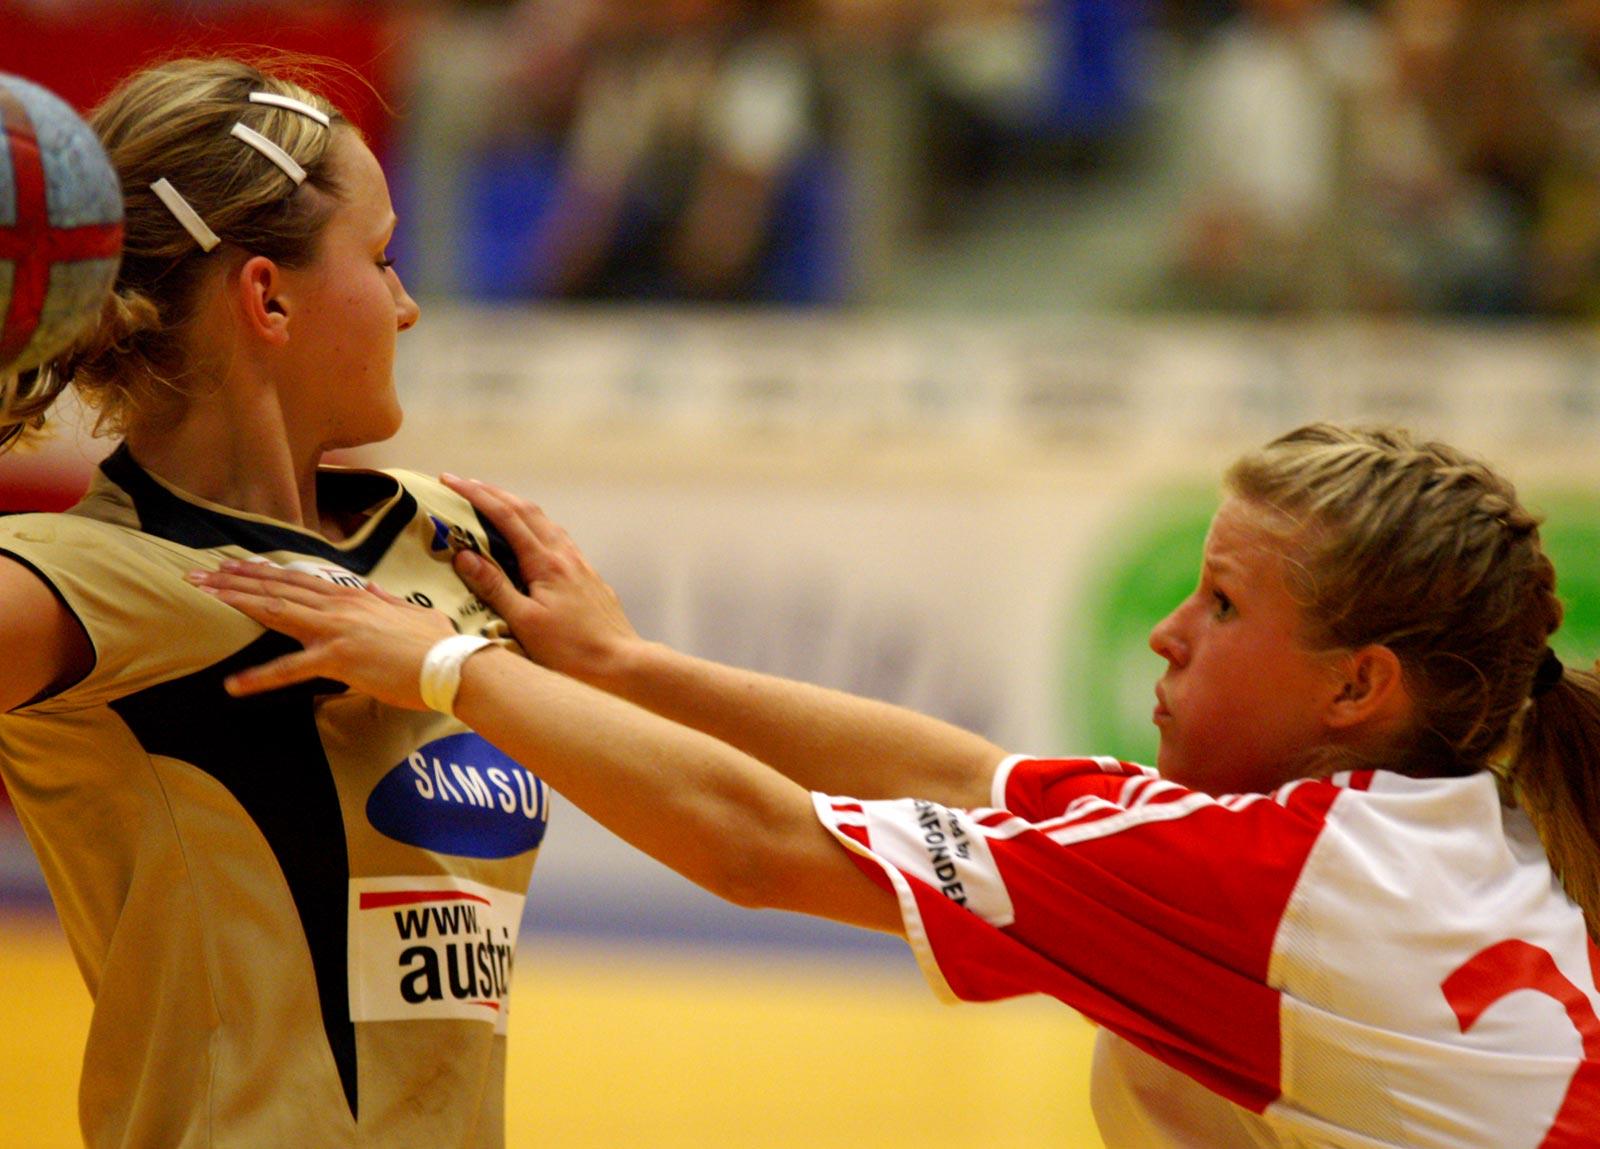 Handball- Das Problem mit dem Harz